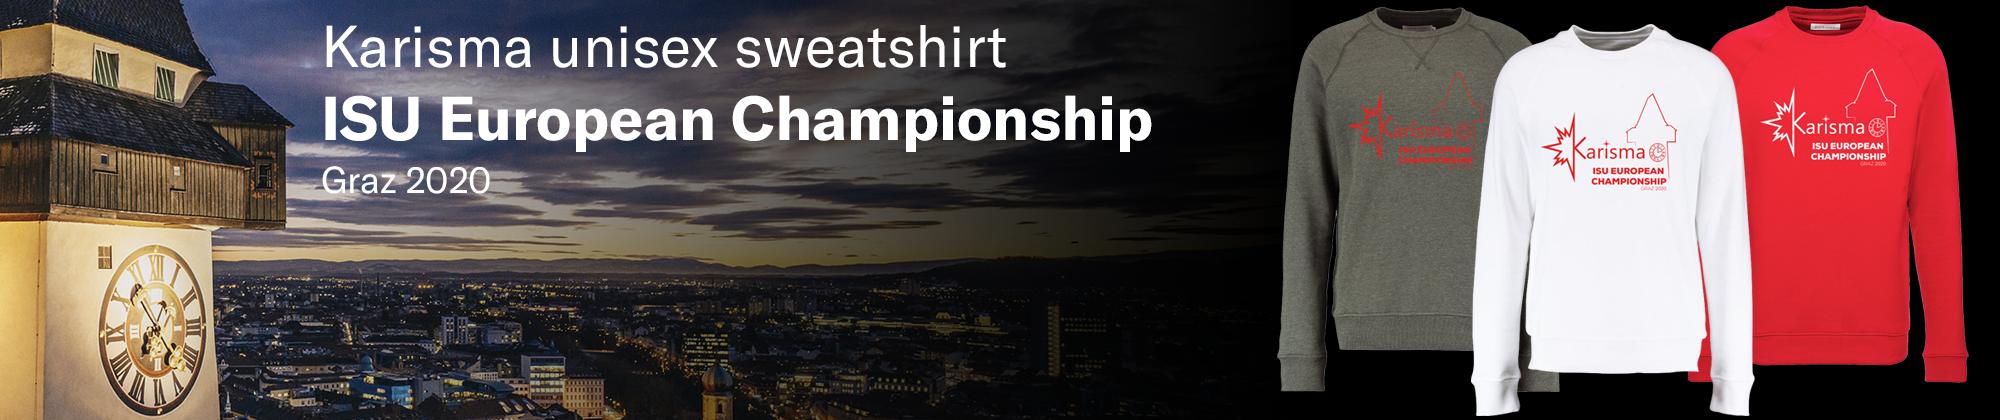 ISU European Championship sweatshirt